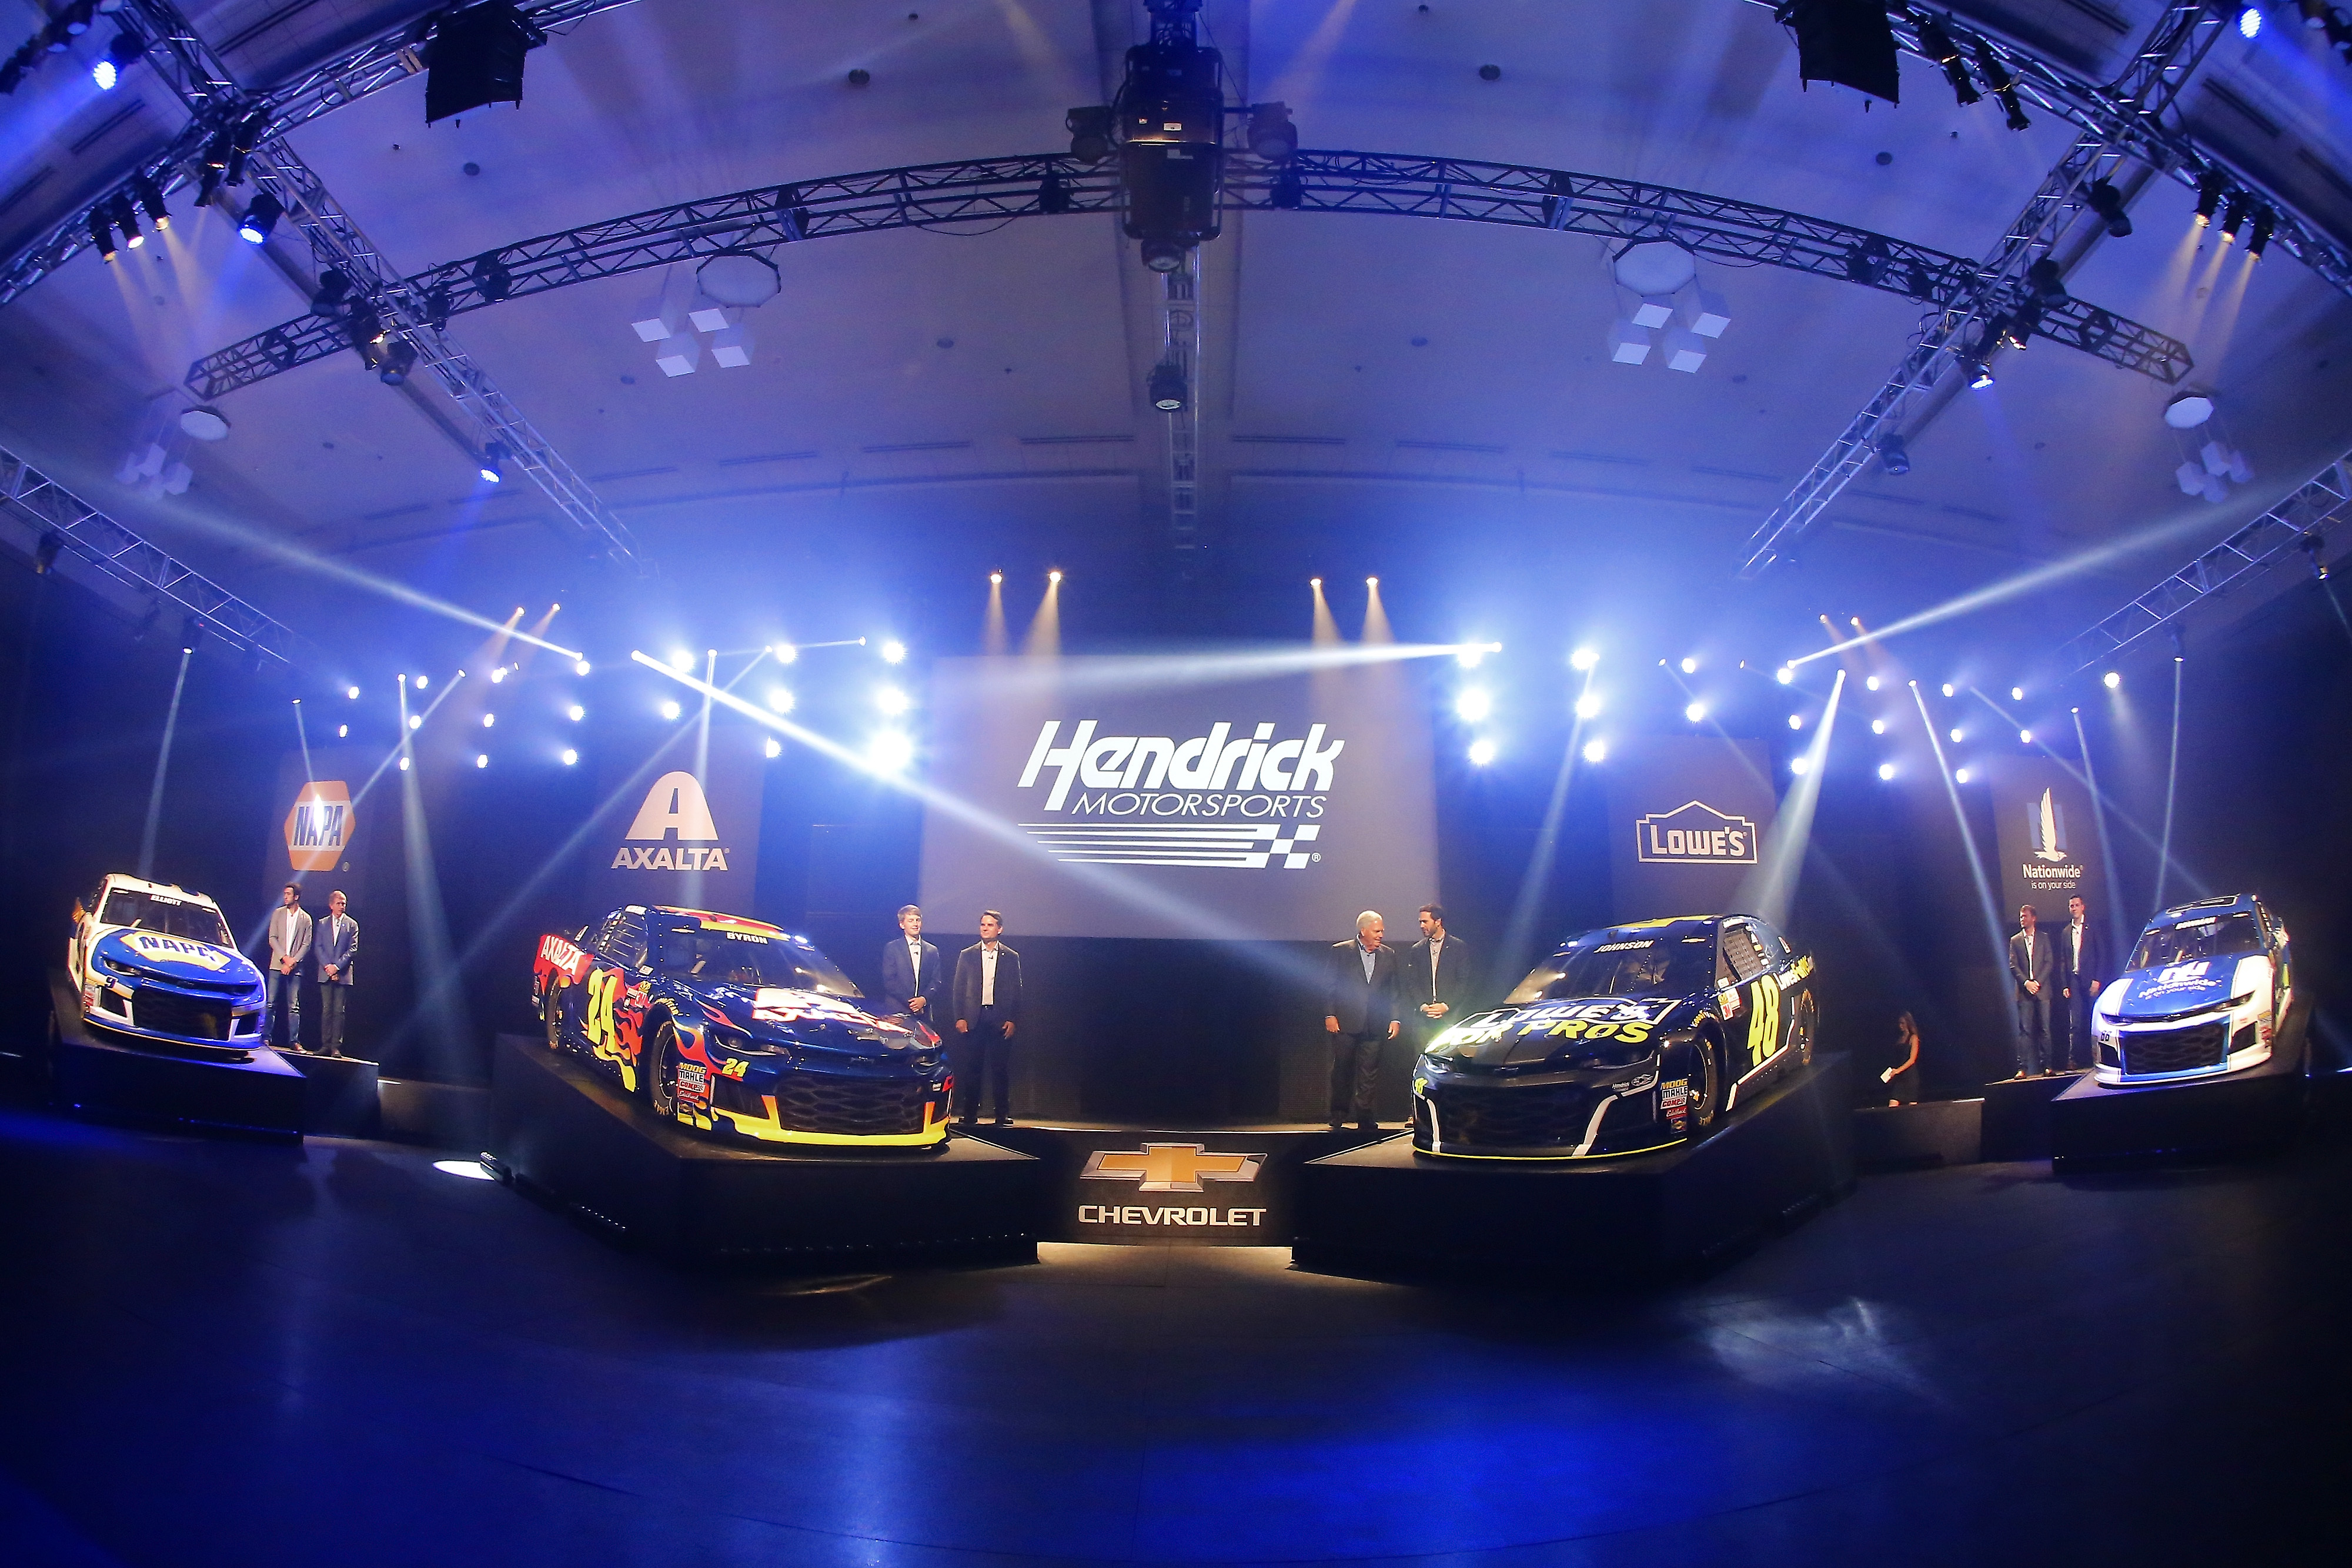 NASCAR announces stage lengths for 2018 season   Hendrick Motorsports